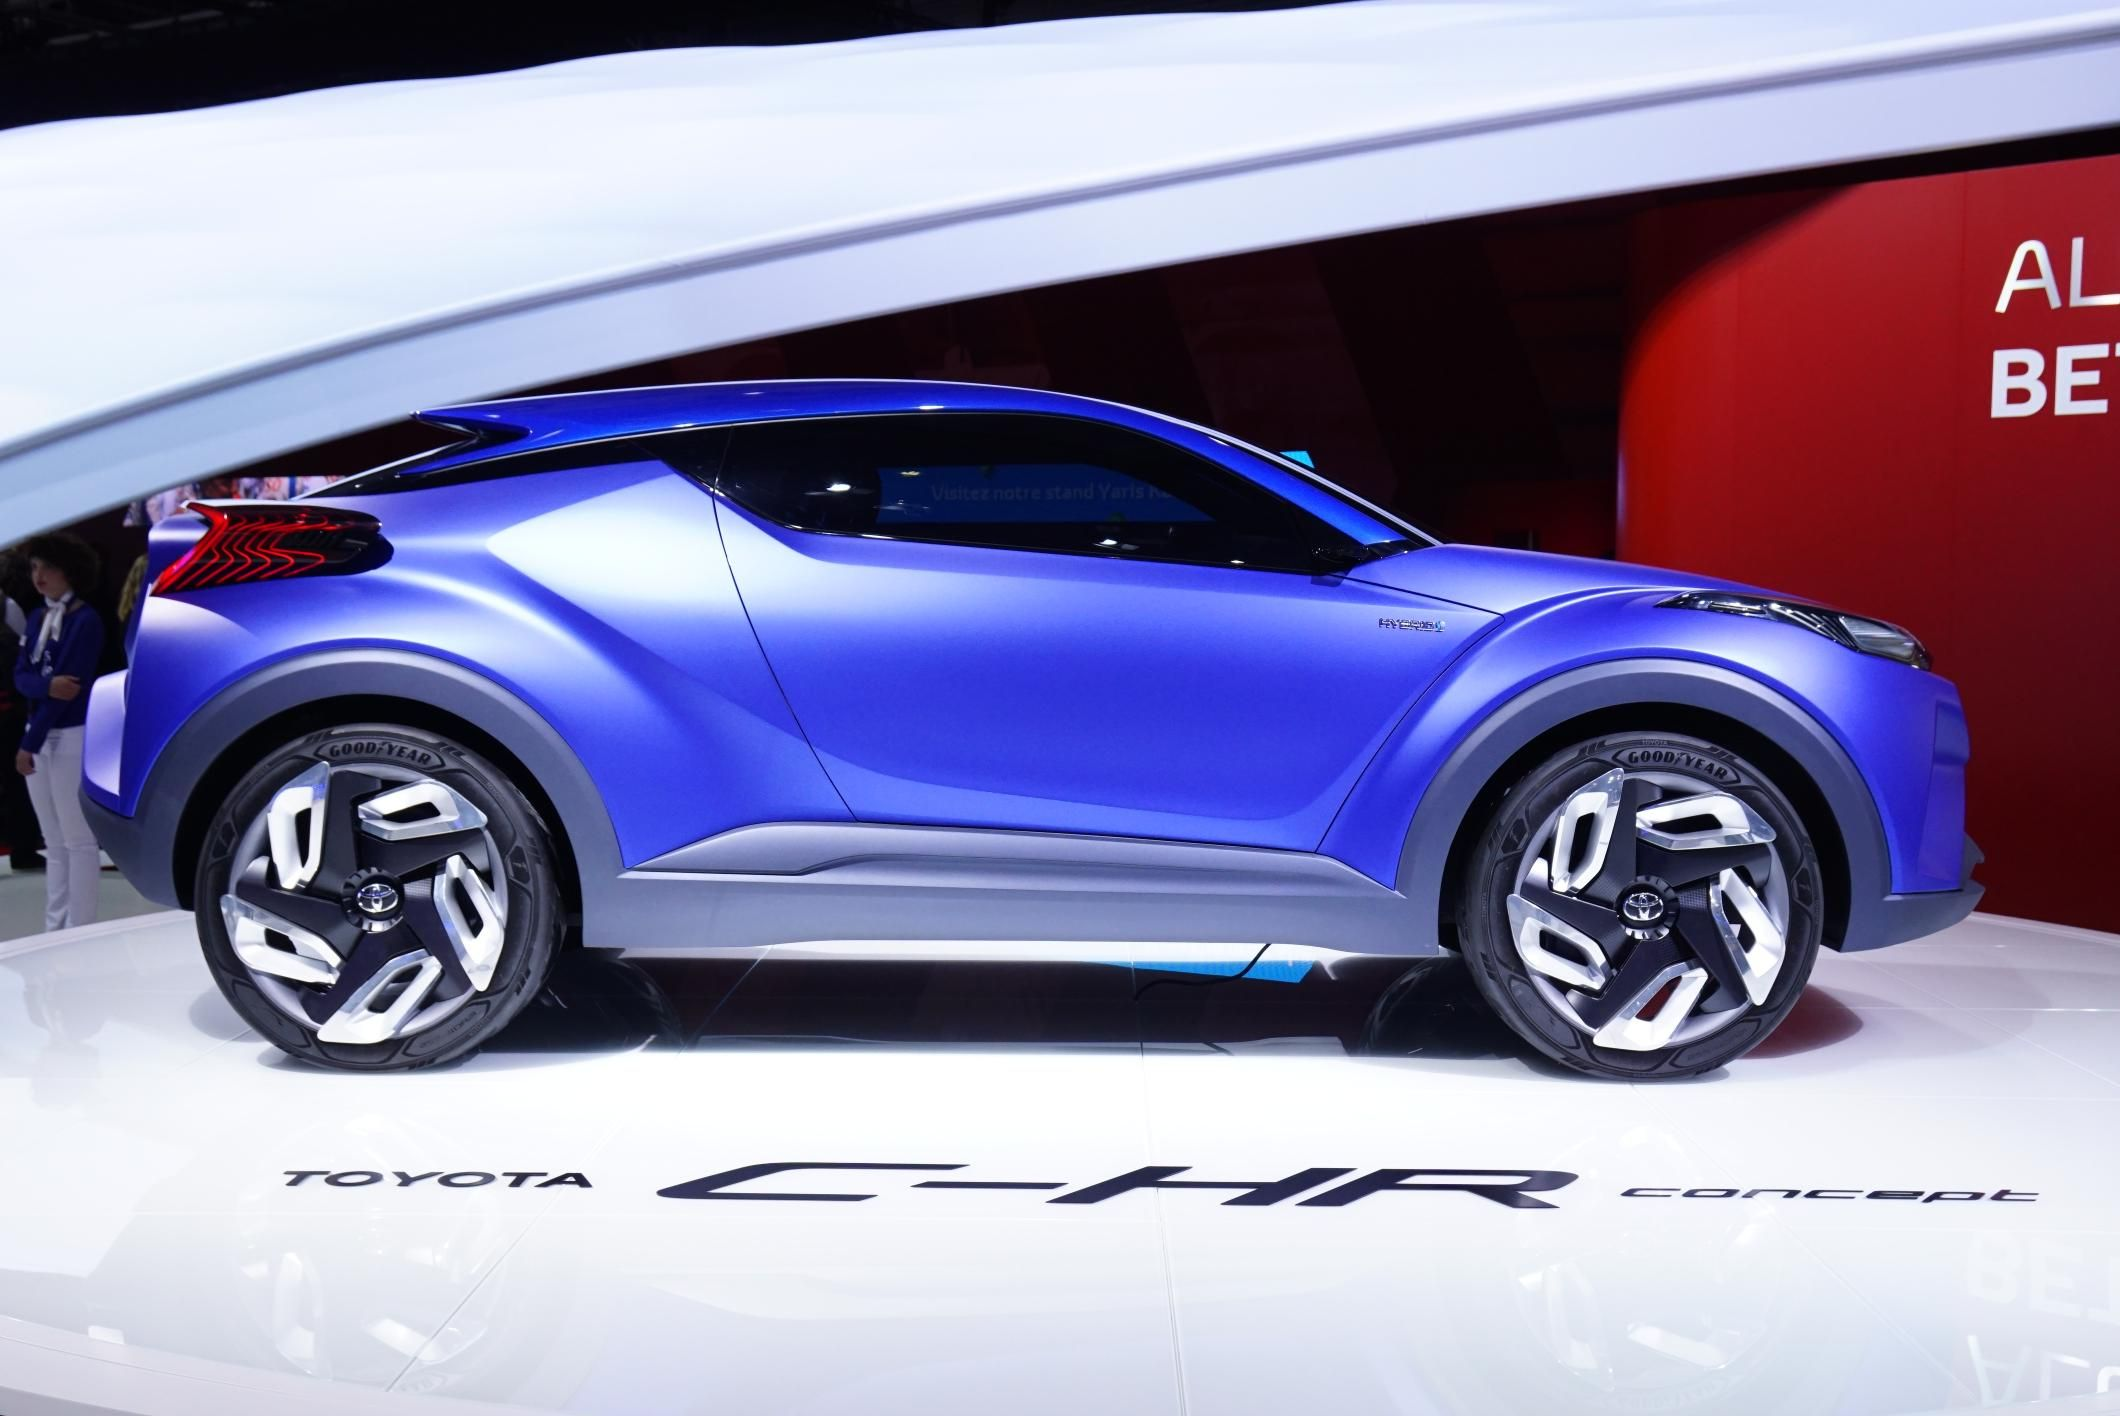 toyota ch r concept motor toyota pinterest toyota cars and rh pinterest com